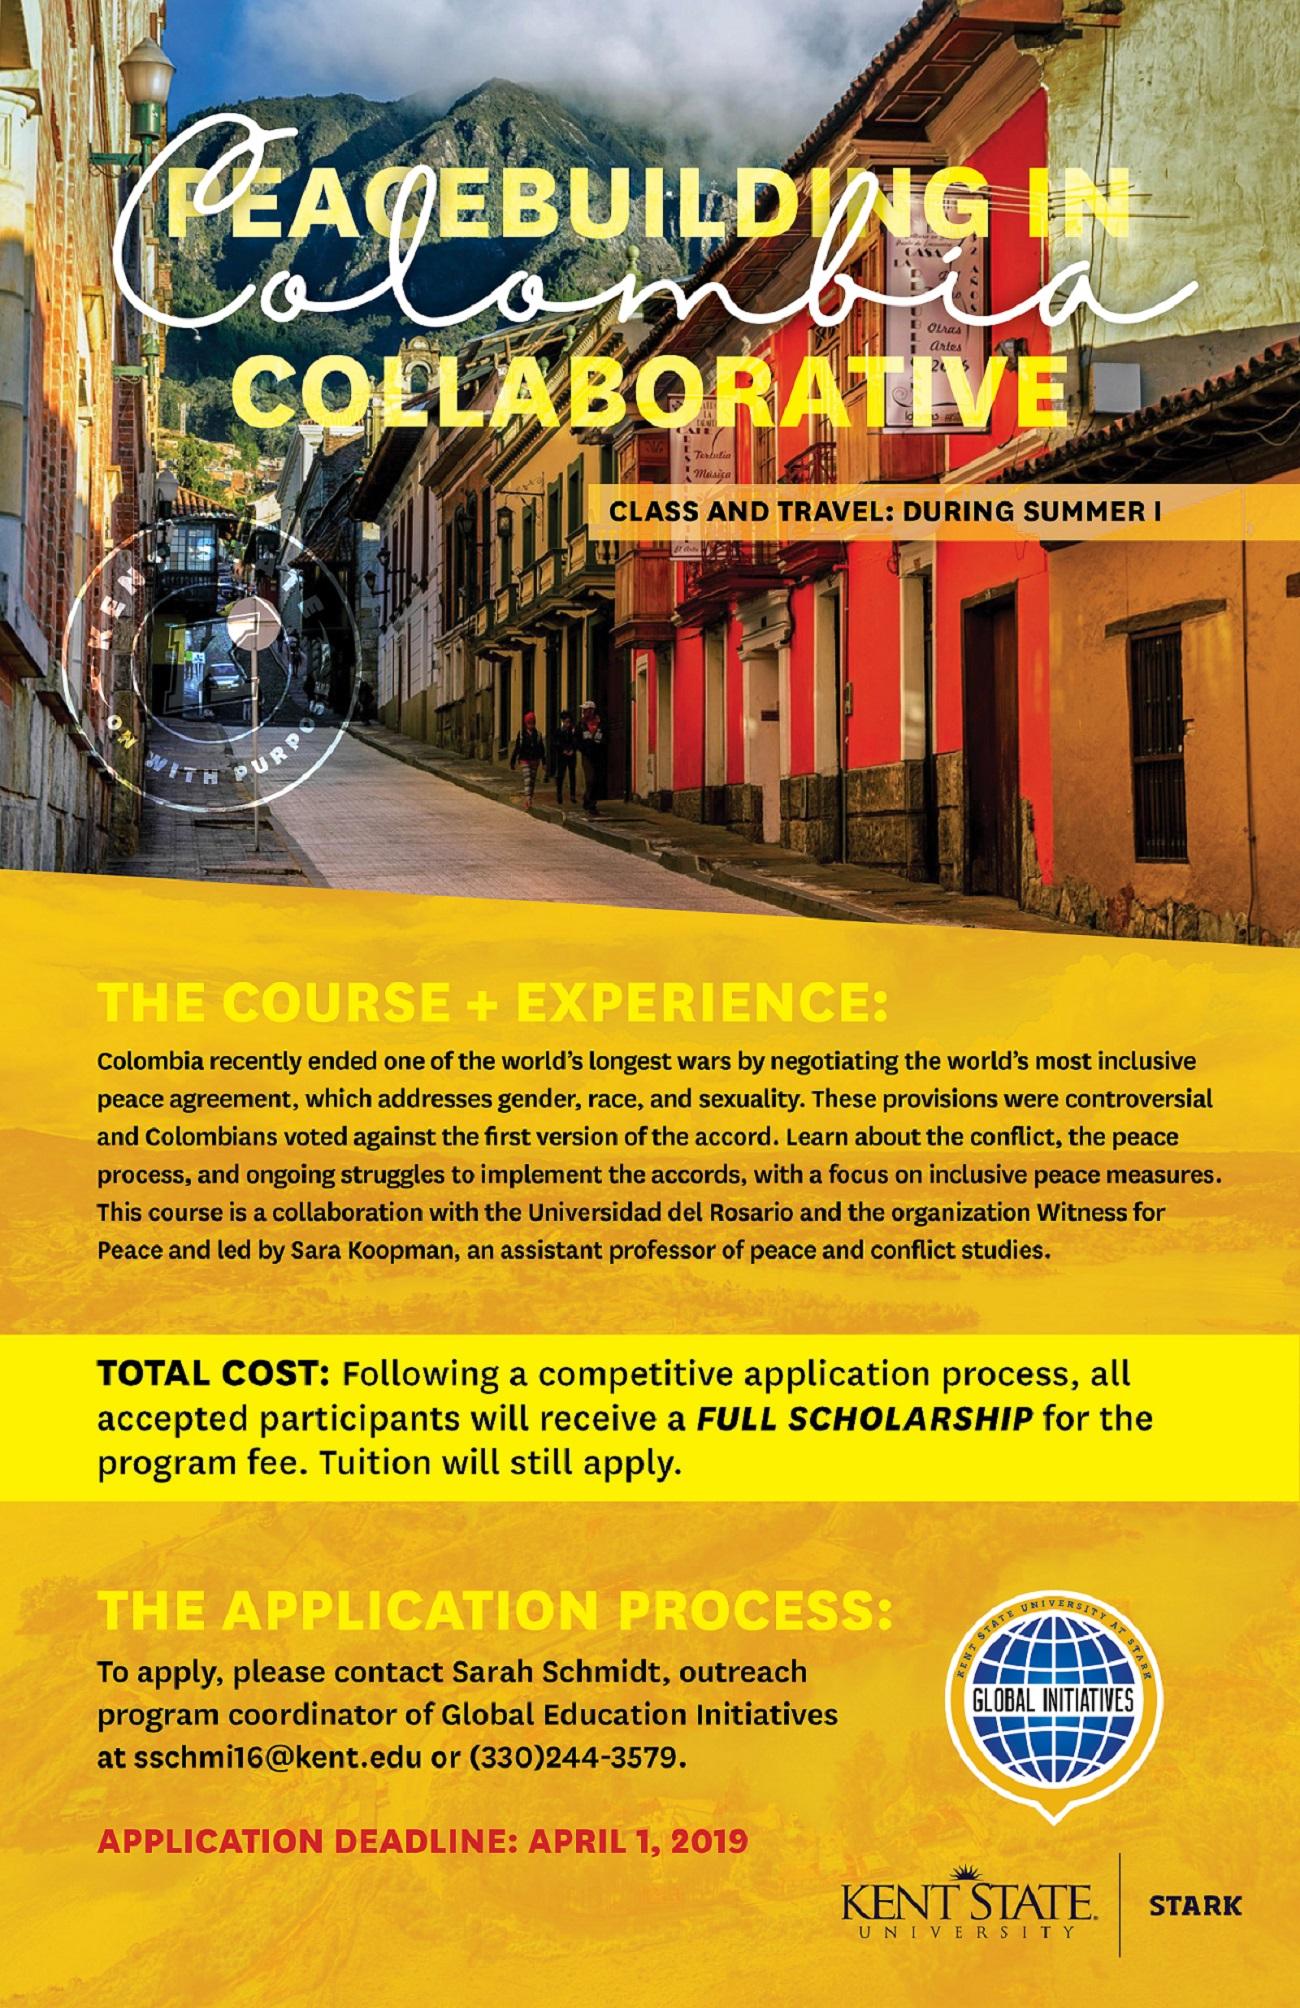 Peacebuilding in Colombia Collaborative flyer